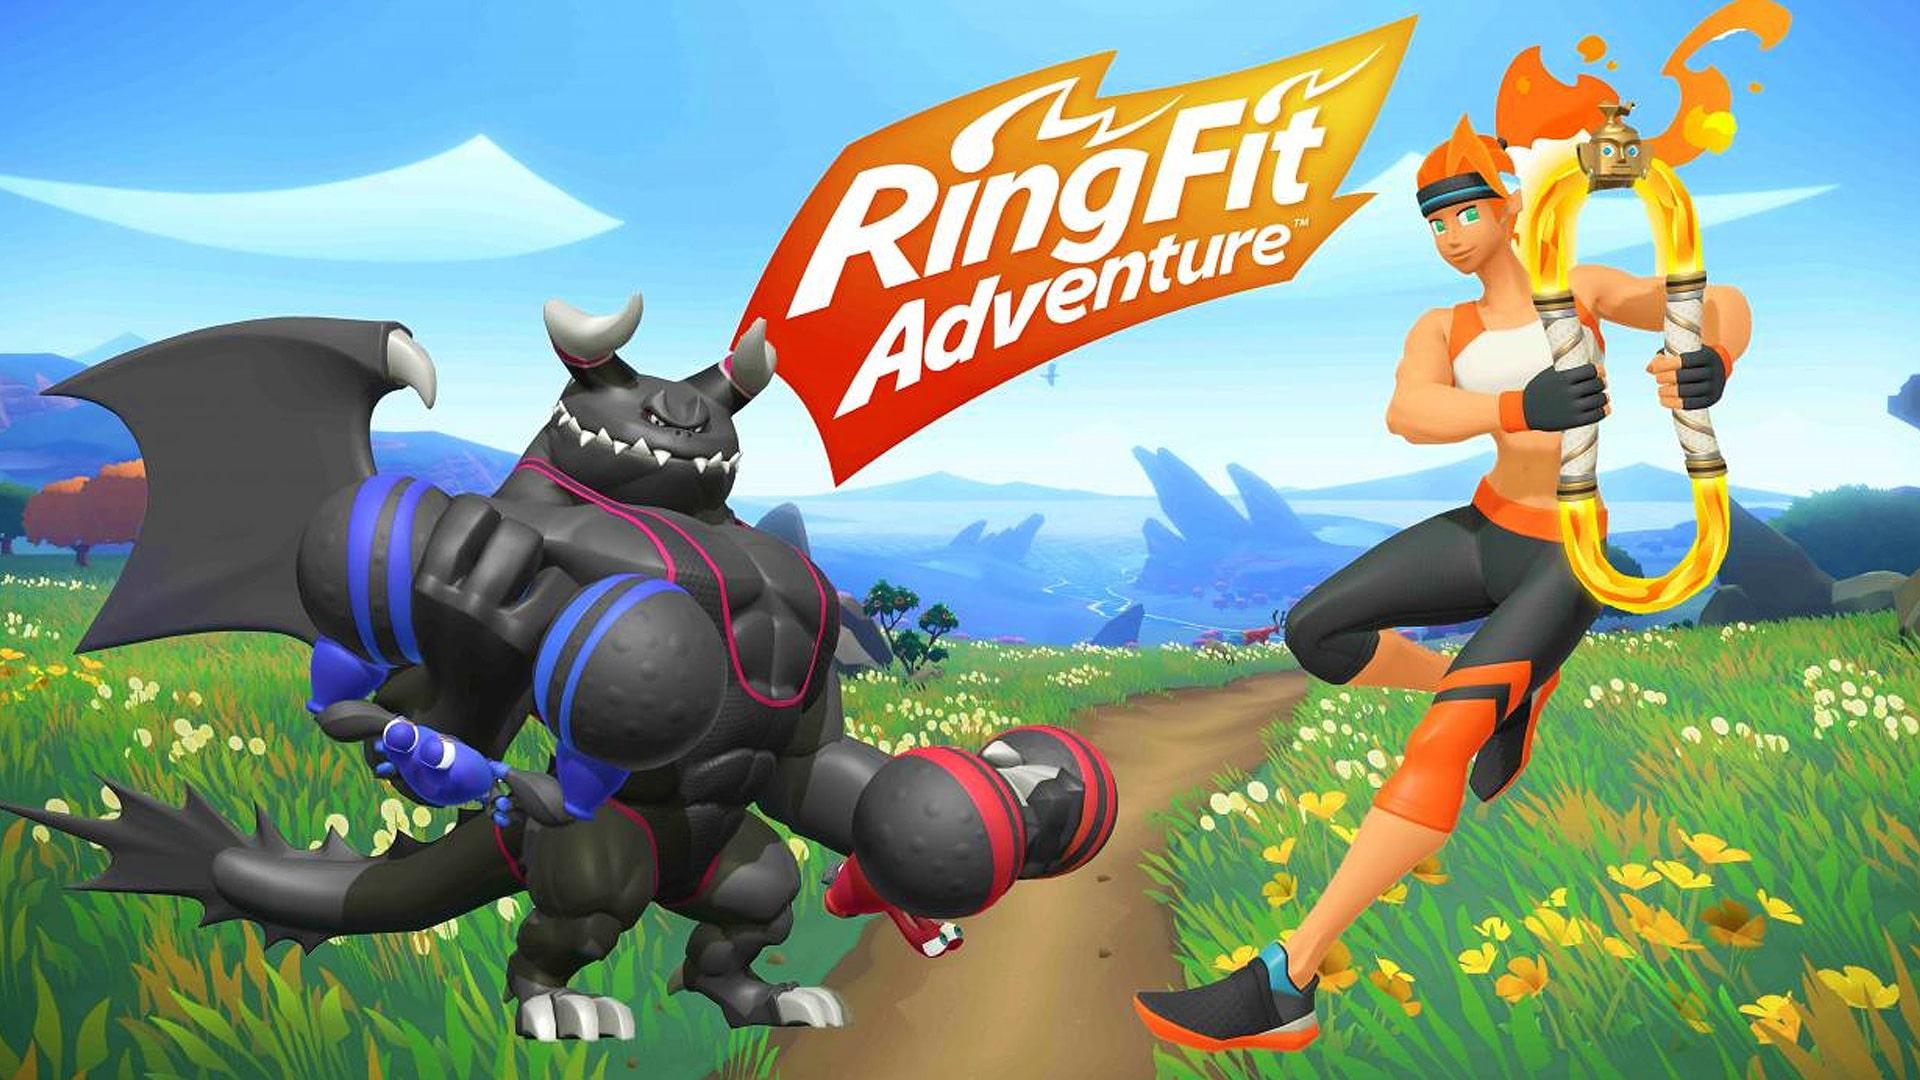 Test du jeu Ring Fit Adventure (Switch) - M2 Gaming